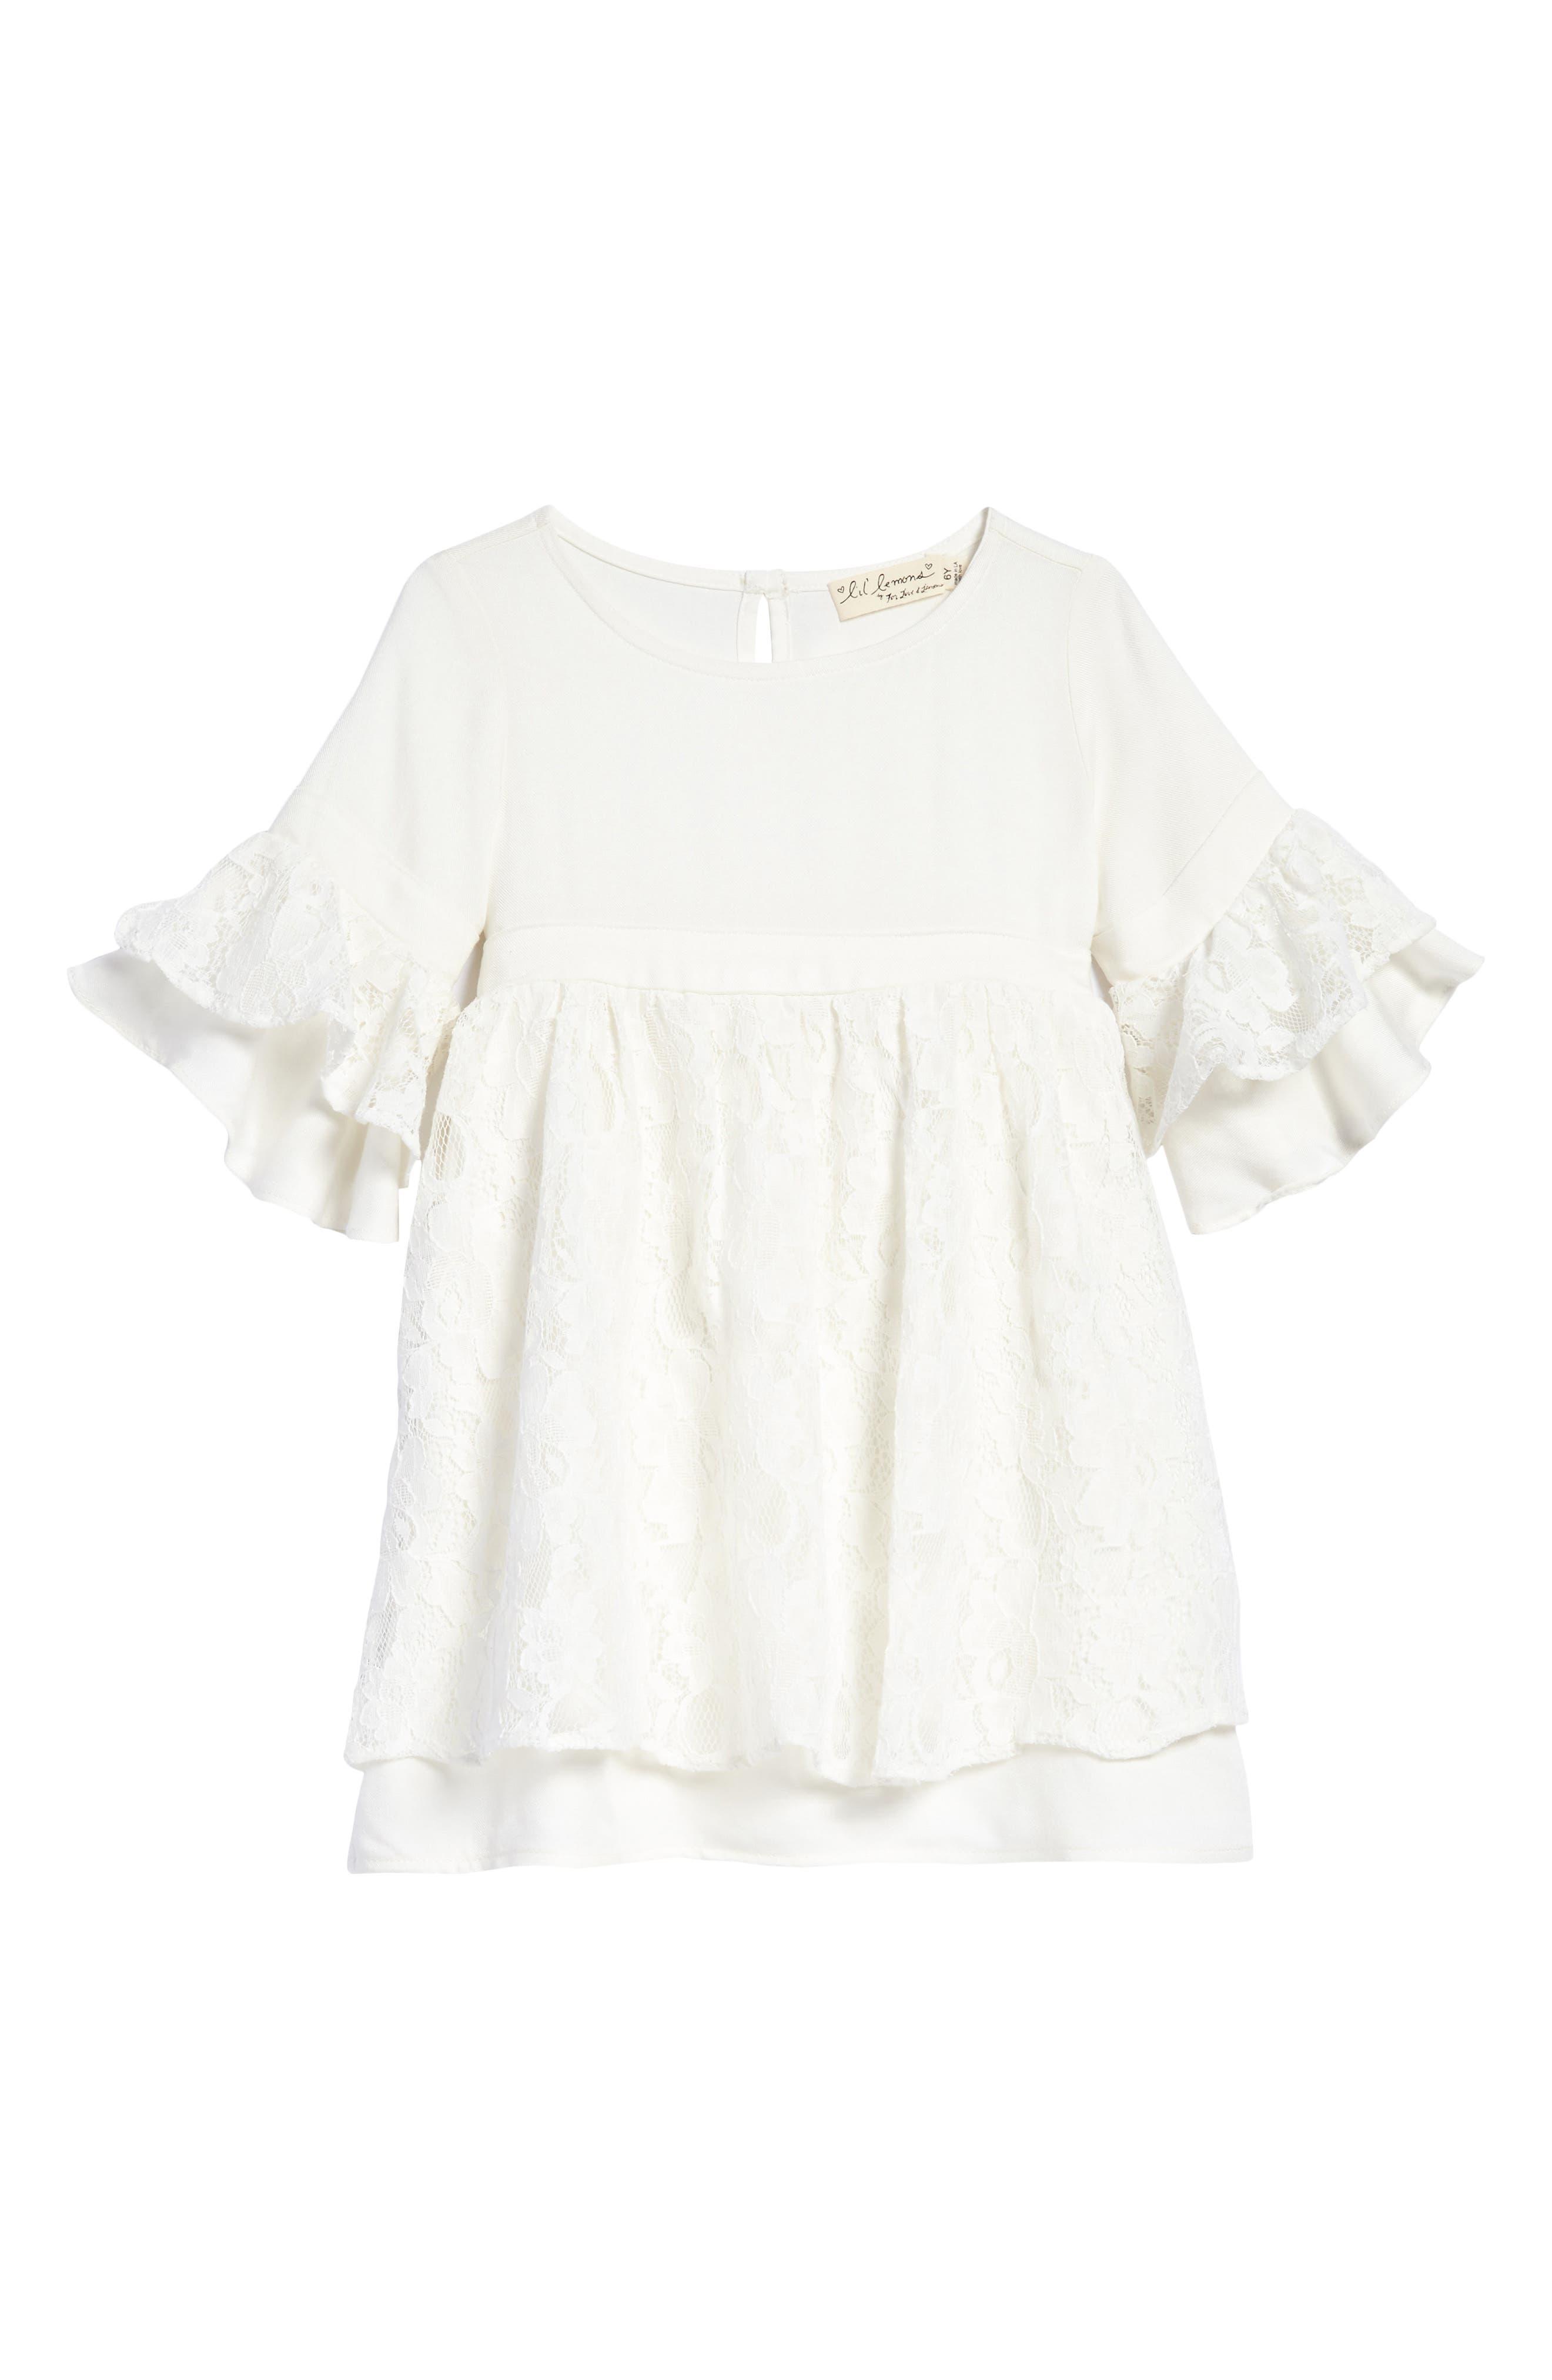 Lyla Lace Dress,                             Main thumbnail 1, color,                             900